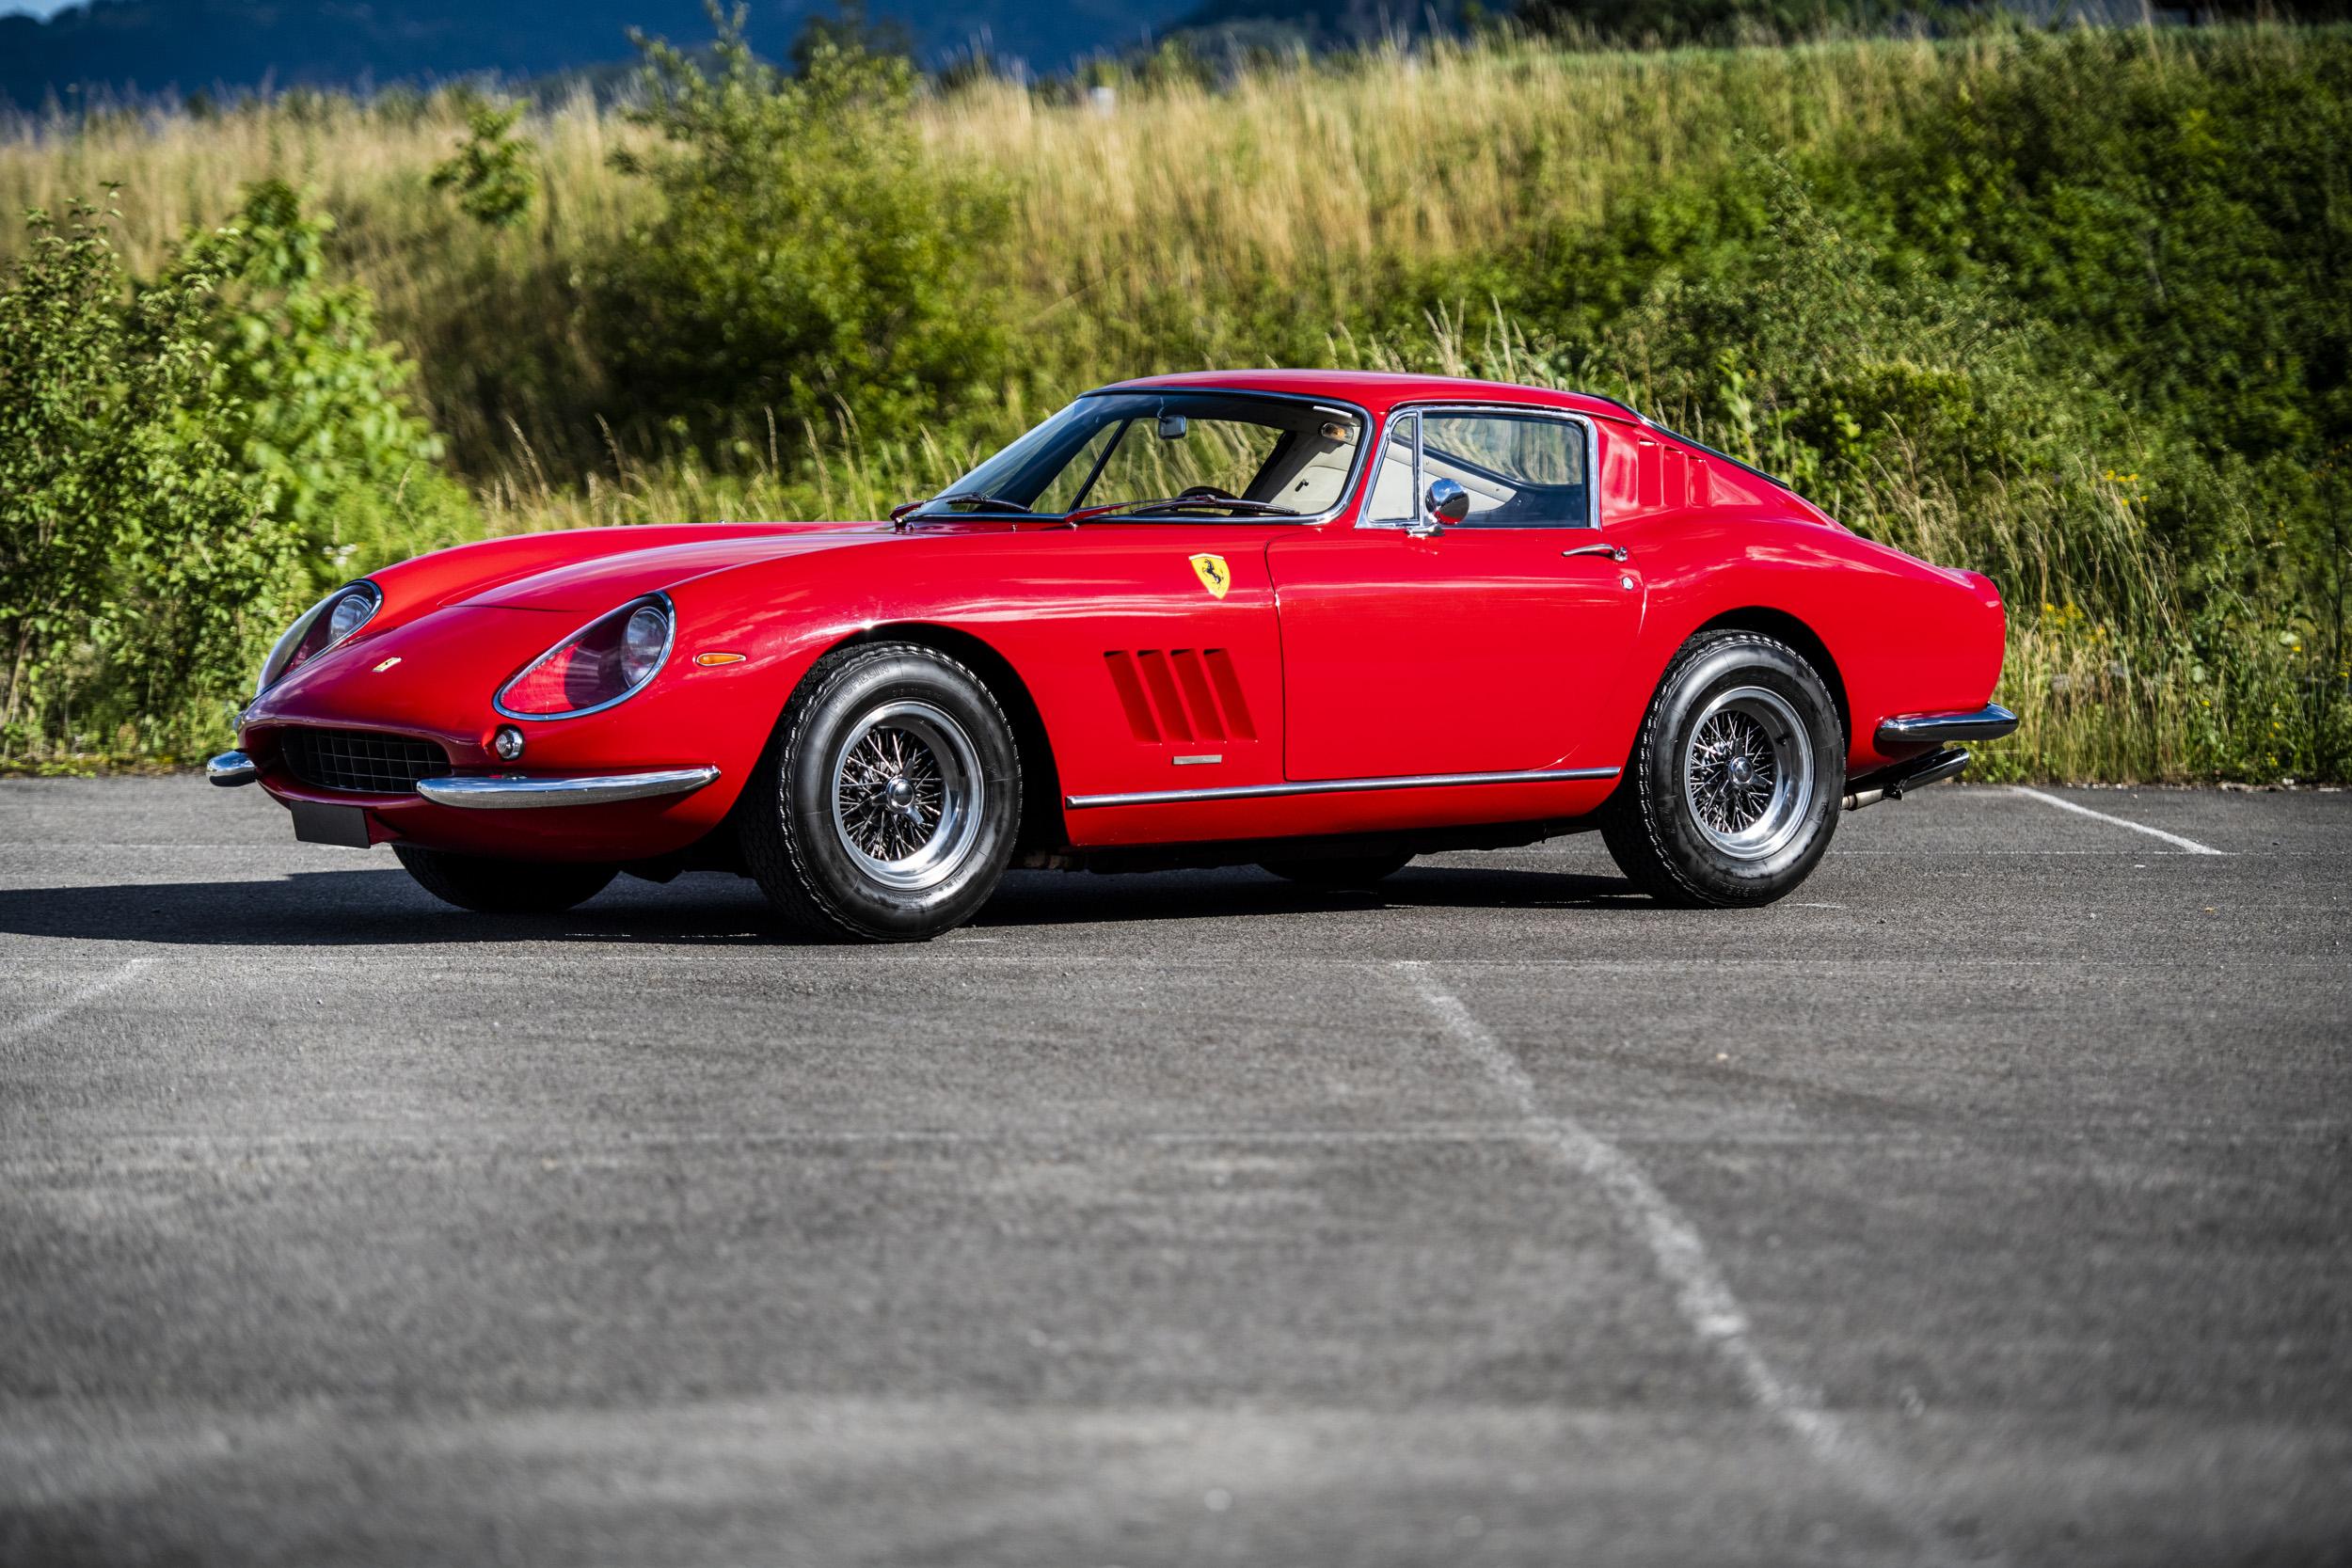 200702 1966 Ferrari 275 GTB Alloy by Scaglietti- Remi Dargegen ©2020 Courtesy of RM Sotheby's